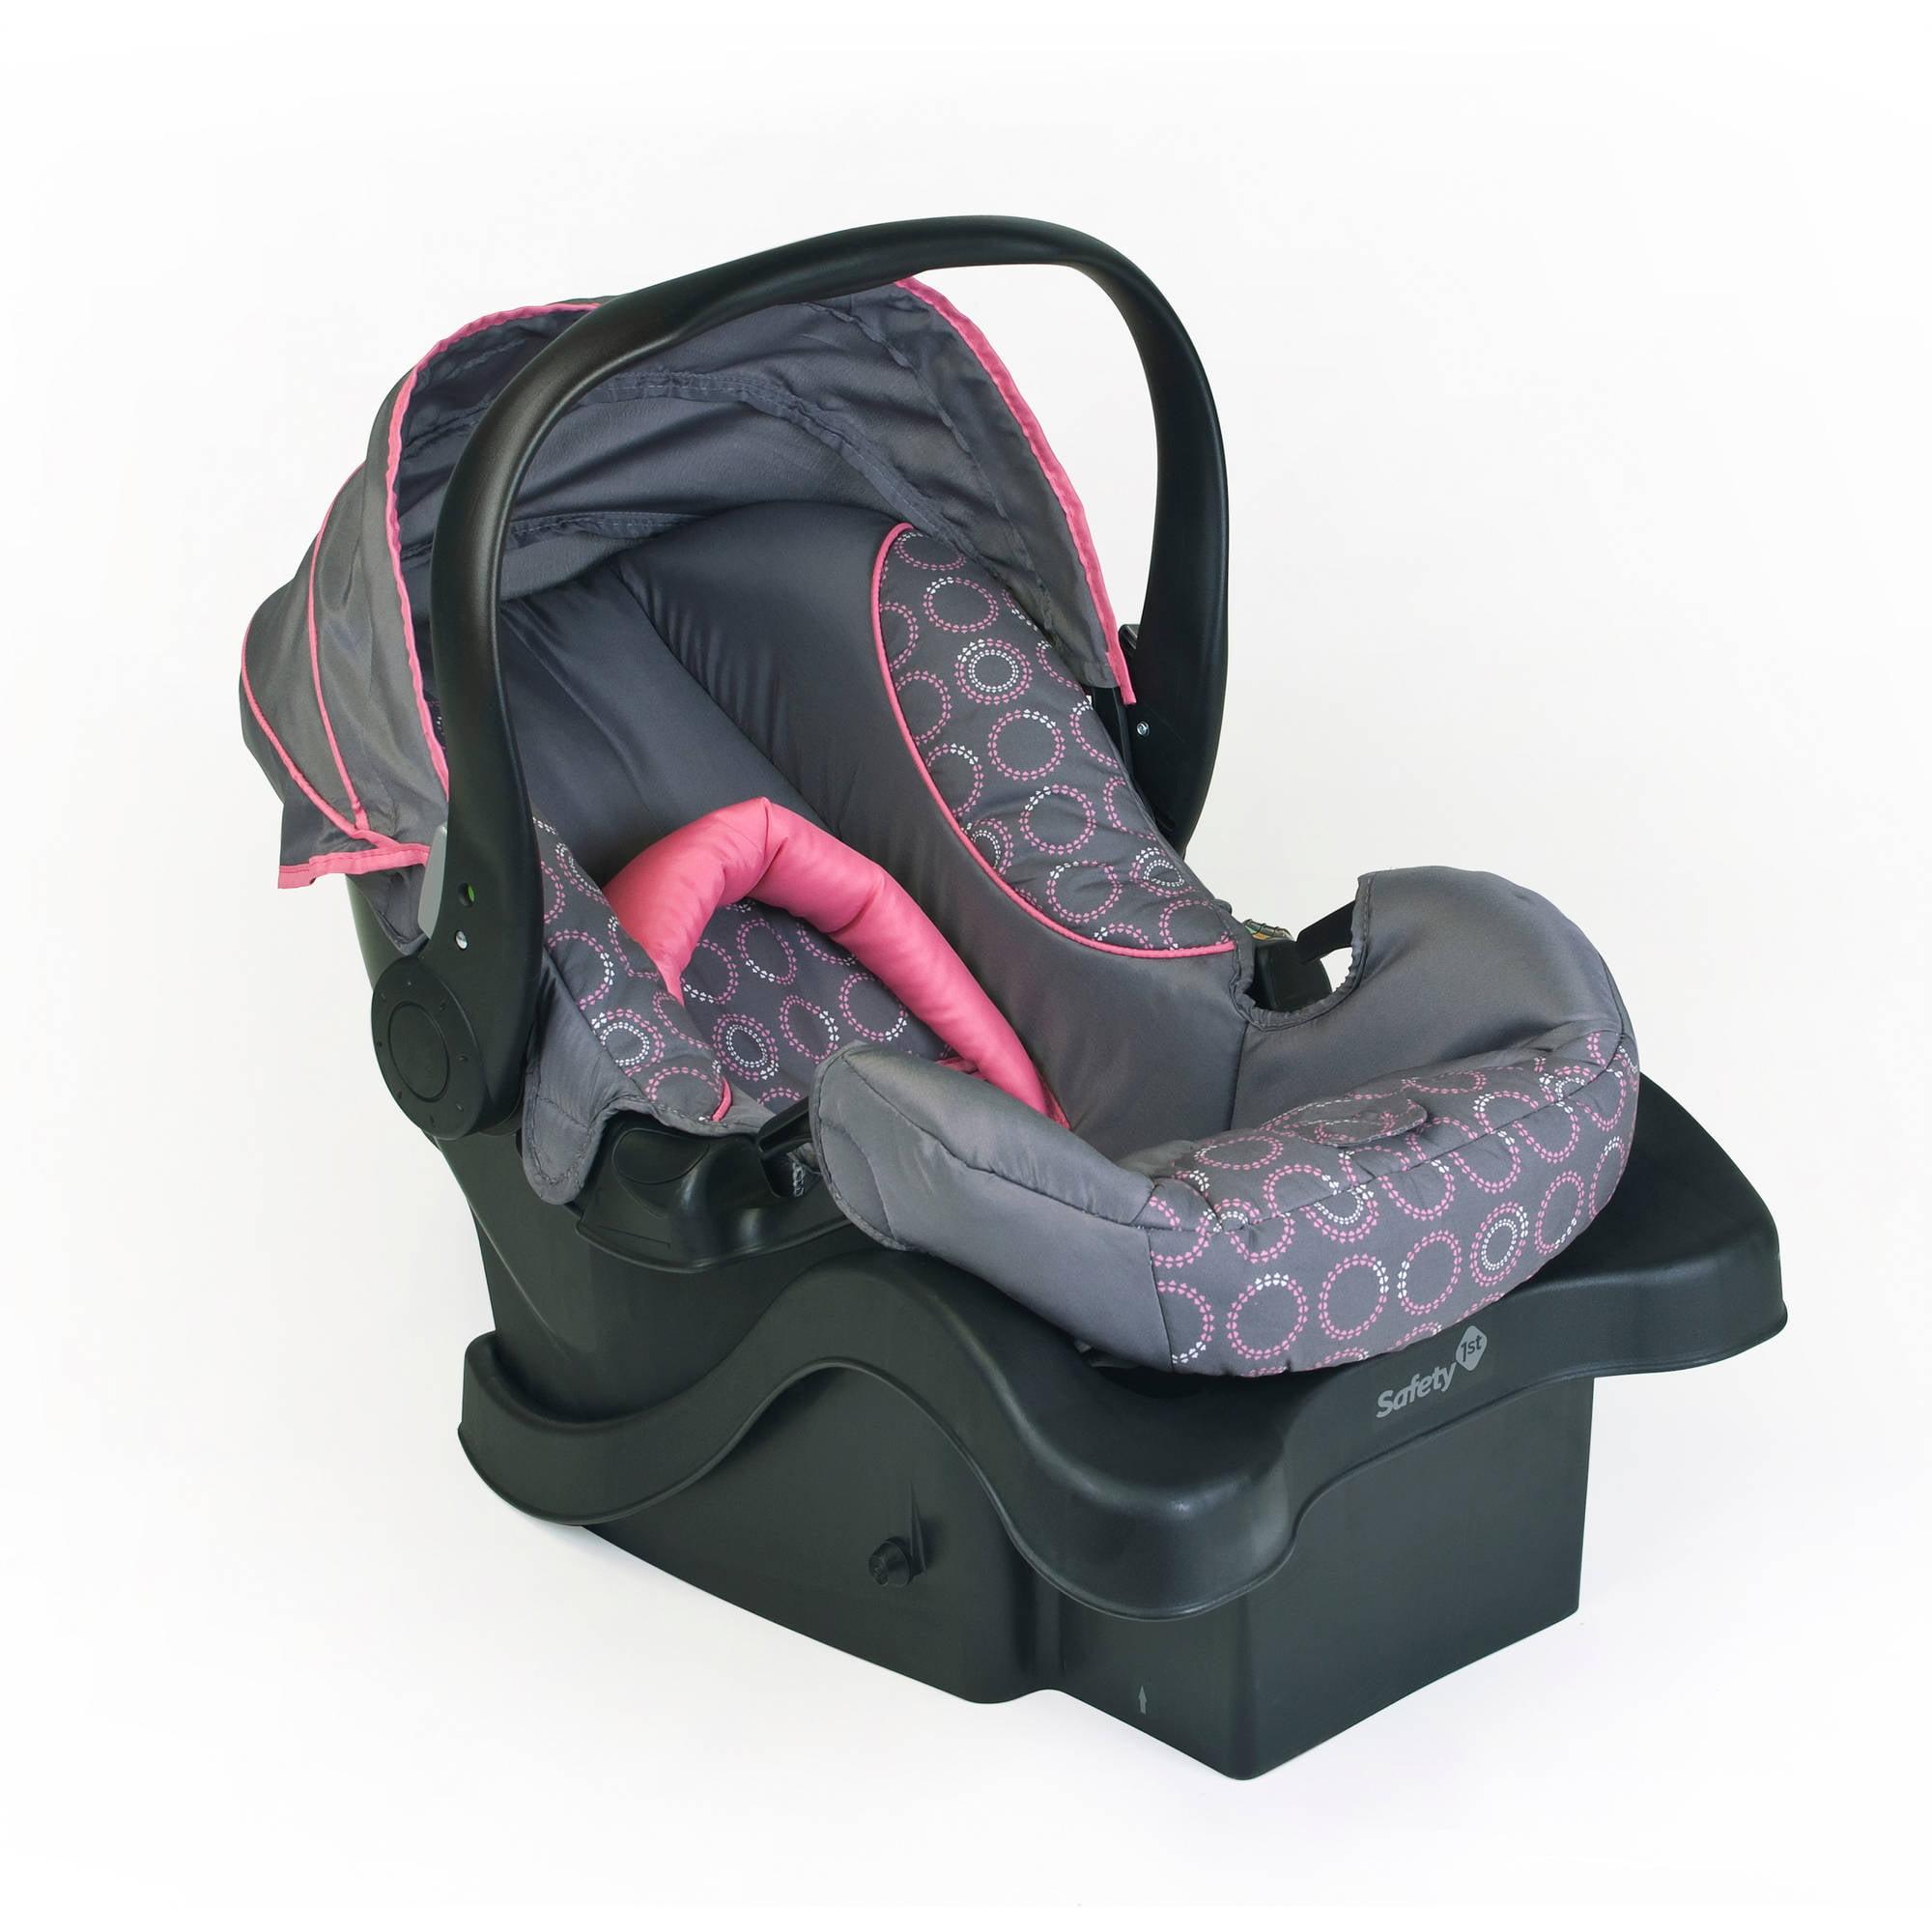 onBoard 35 Infant Car Seat-Theme:Orion Pink - Walmart.com